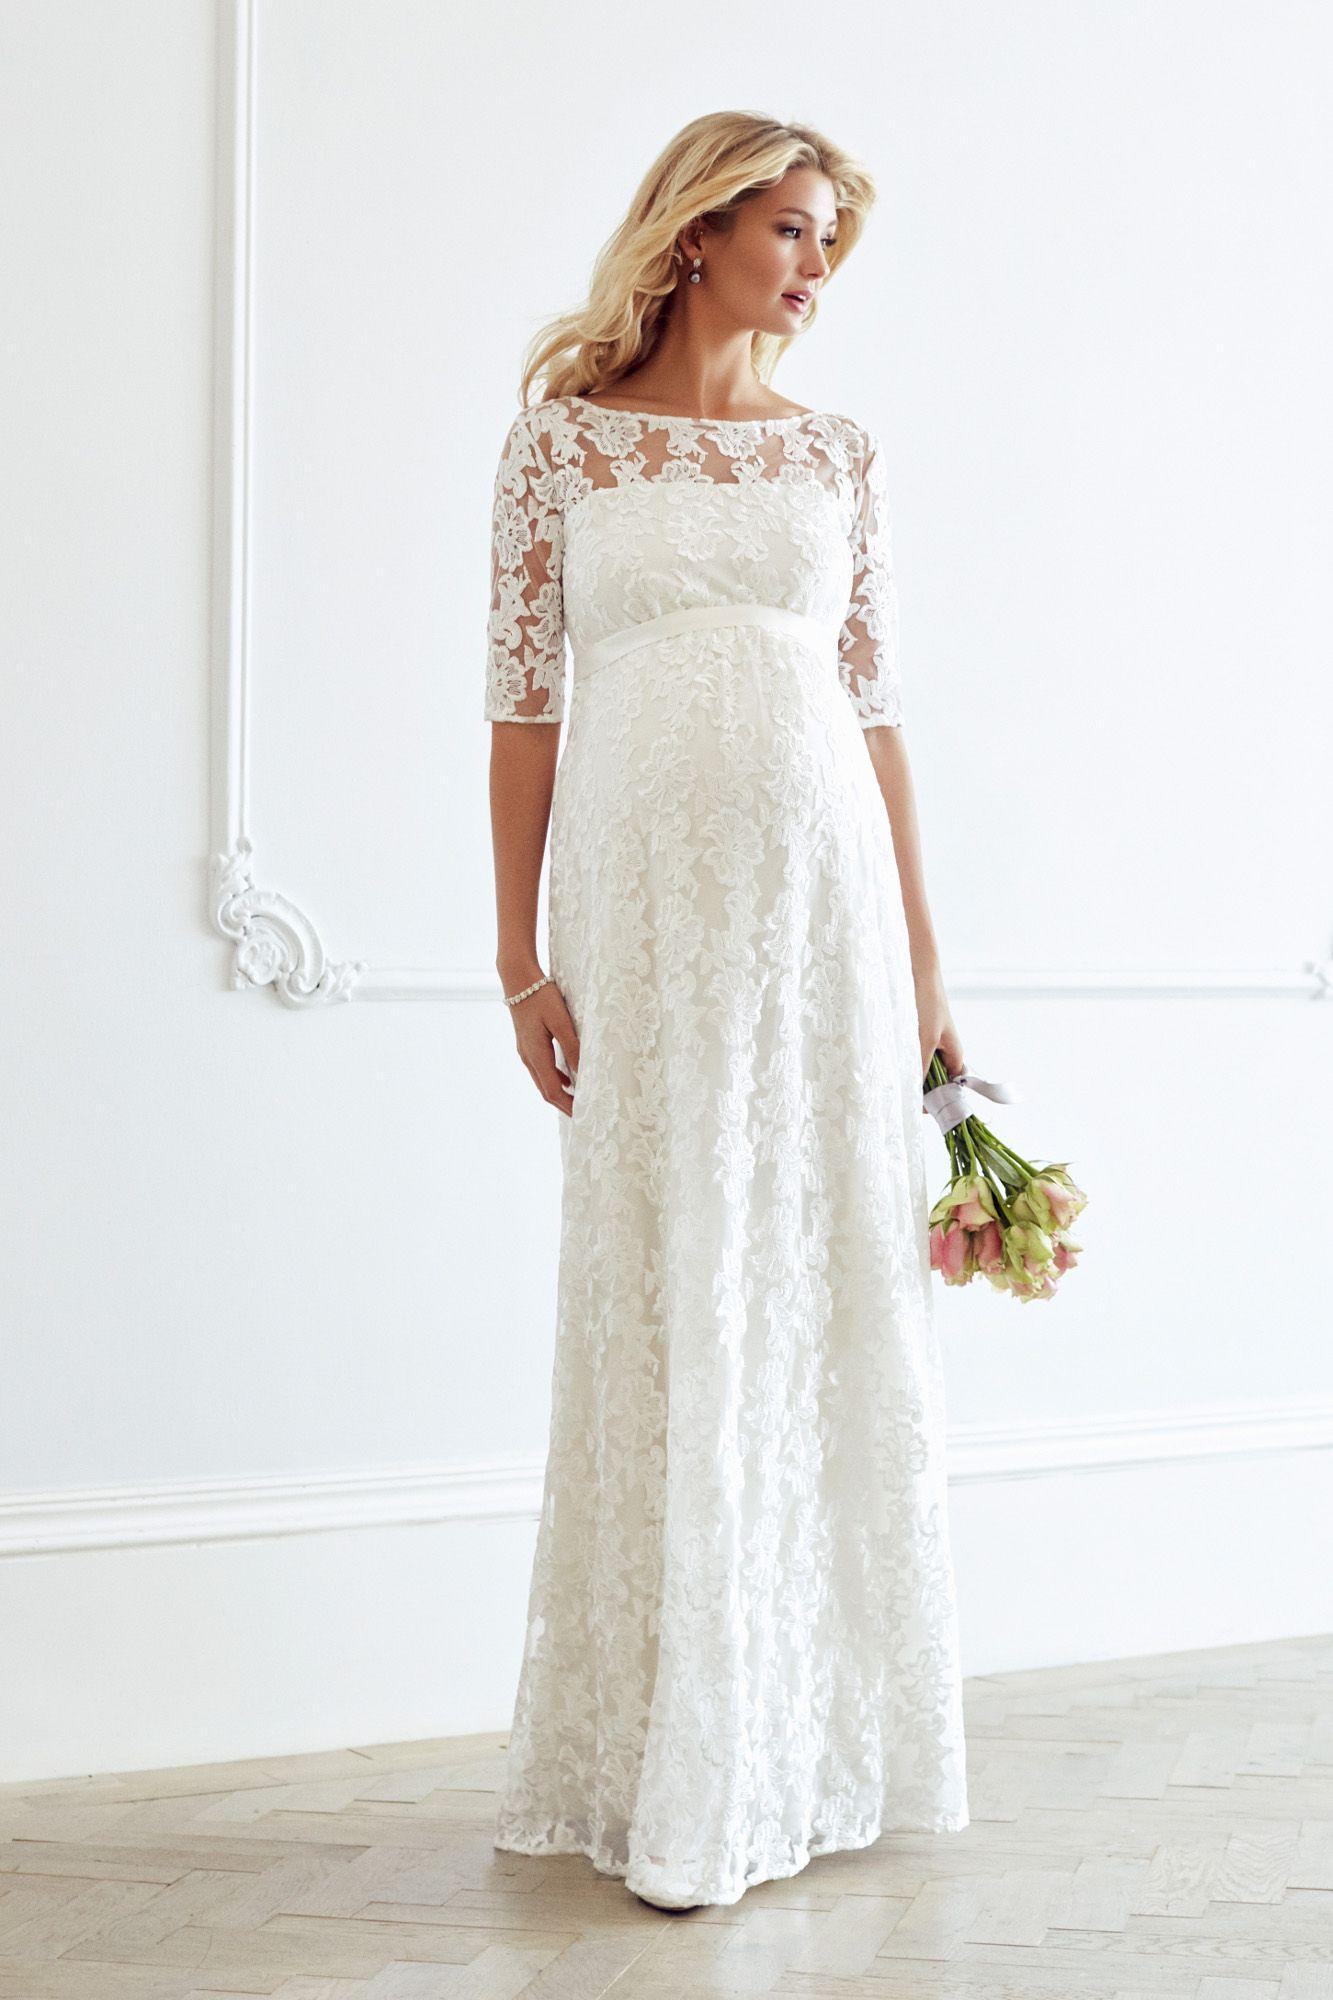 Langes Brautkleid von Tiffany Rose in 17  Umstandskleid